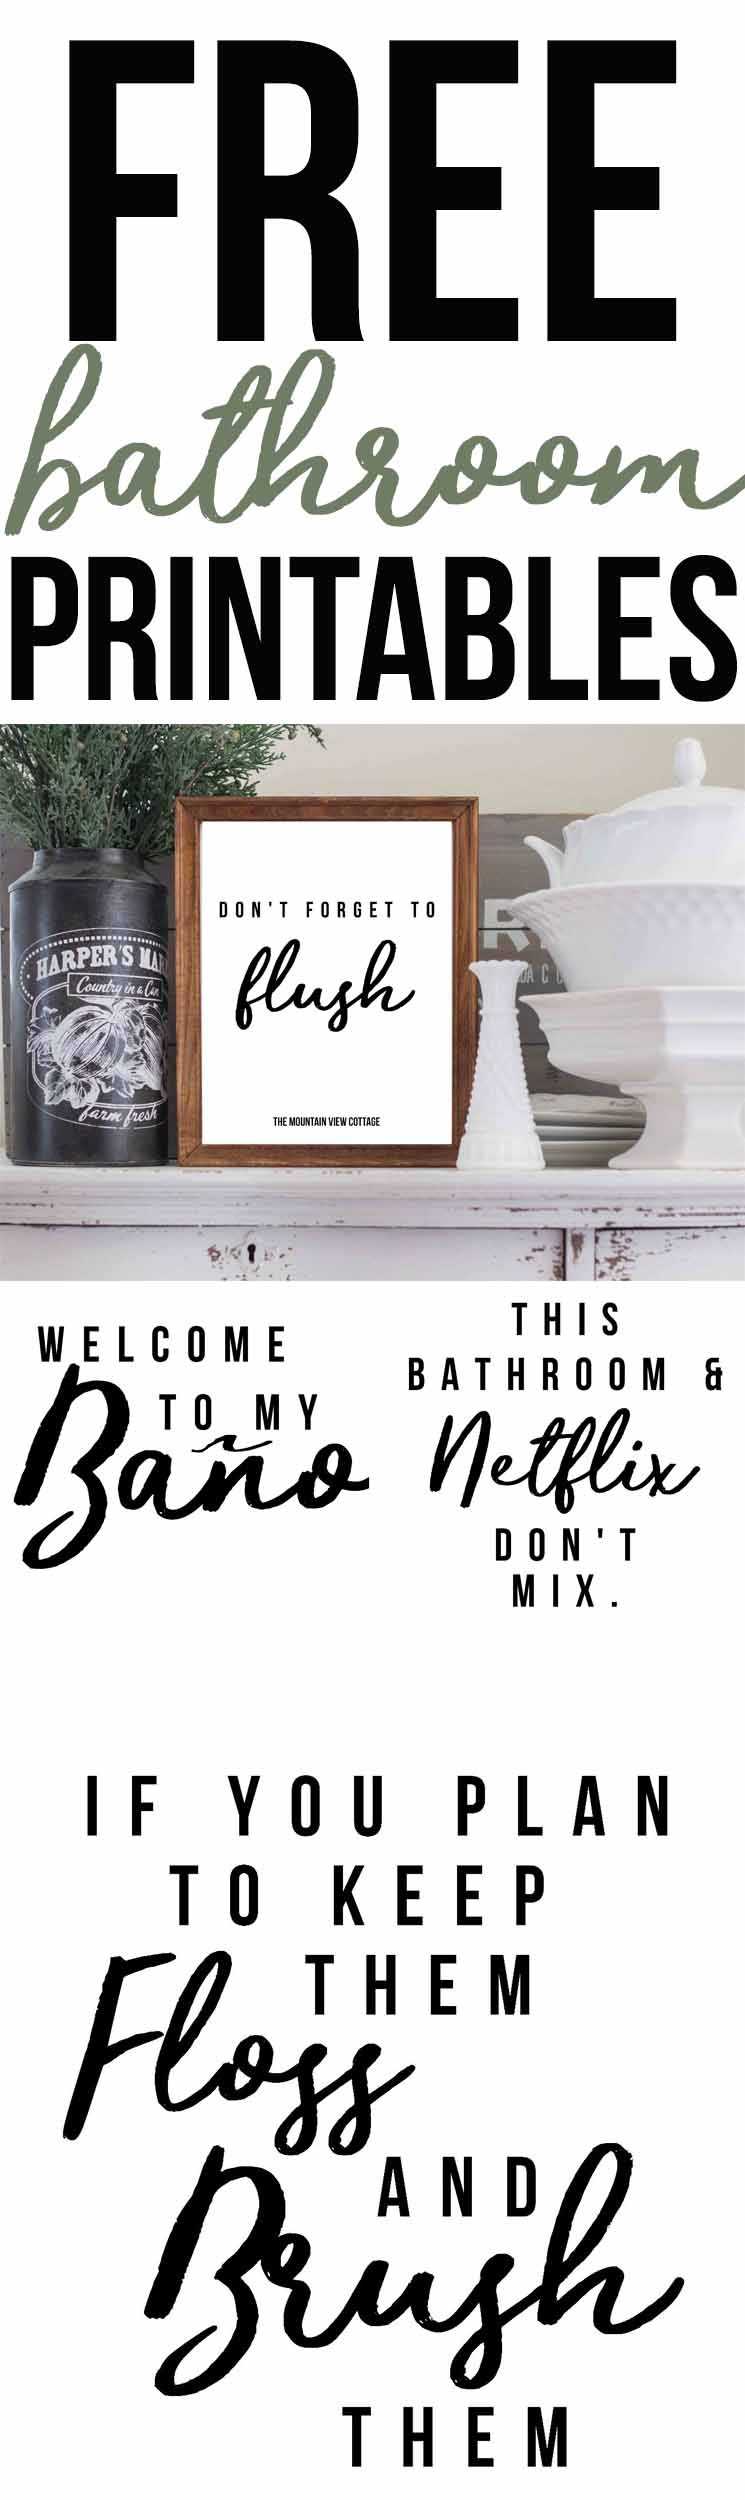 Free Bathroom Printables-Farmhouse Printables - The Mountain View - Free Printable Bathroom Pictures